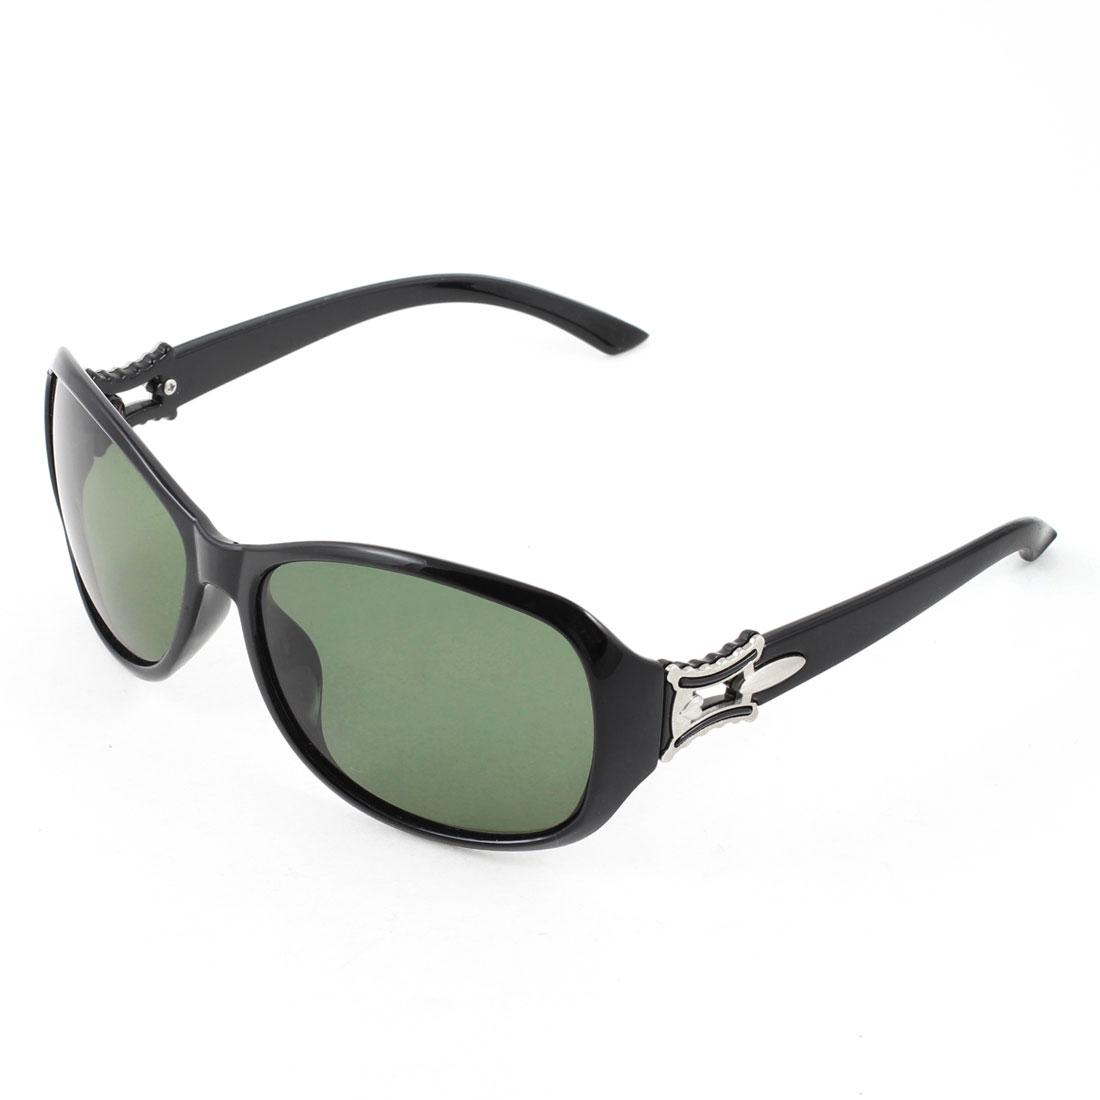 Ladies Woman Black Full Frame Single Bridge Sports Polarized Sunglasses